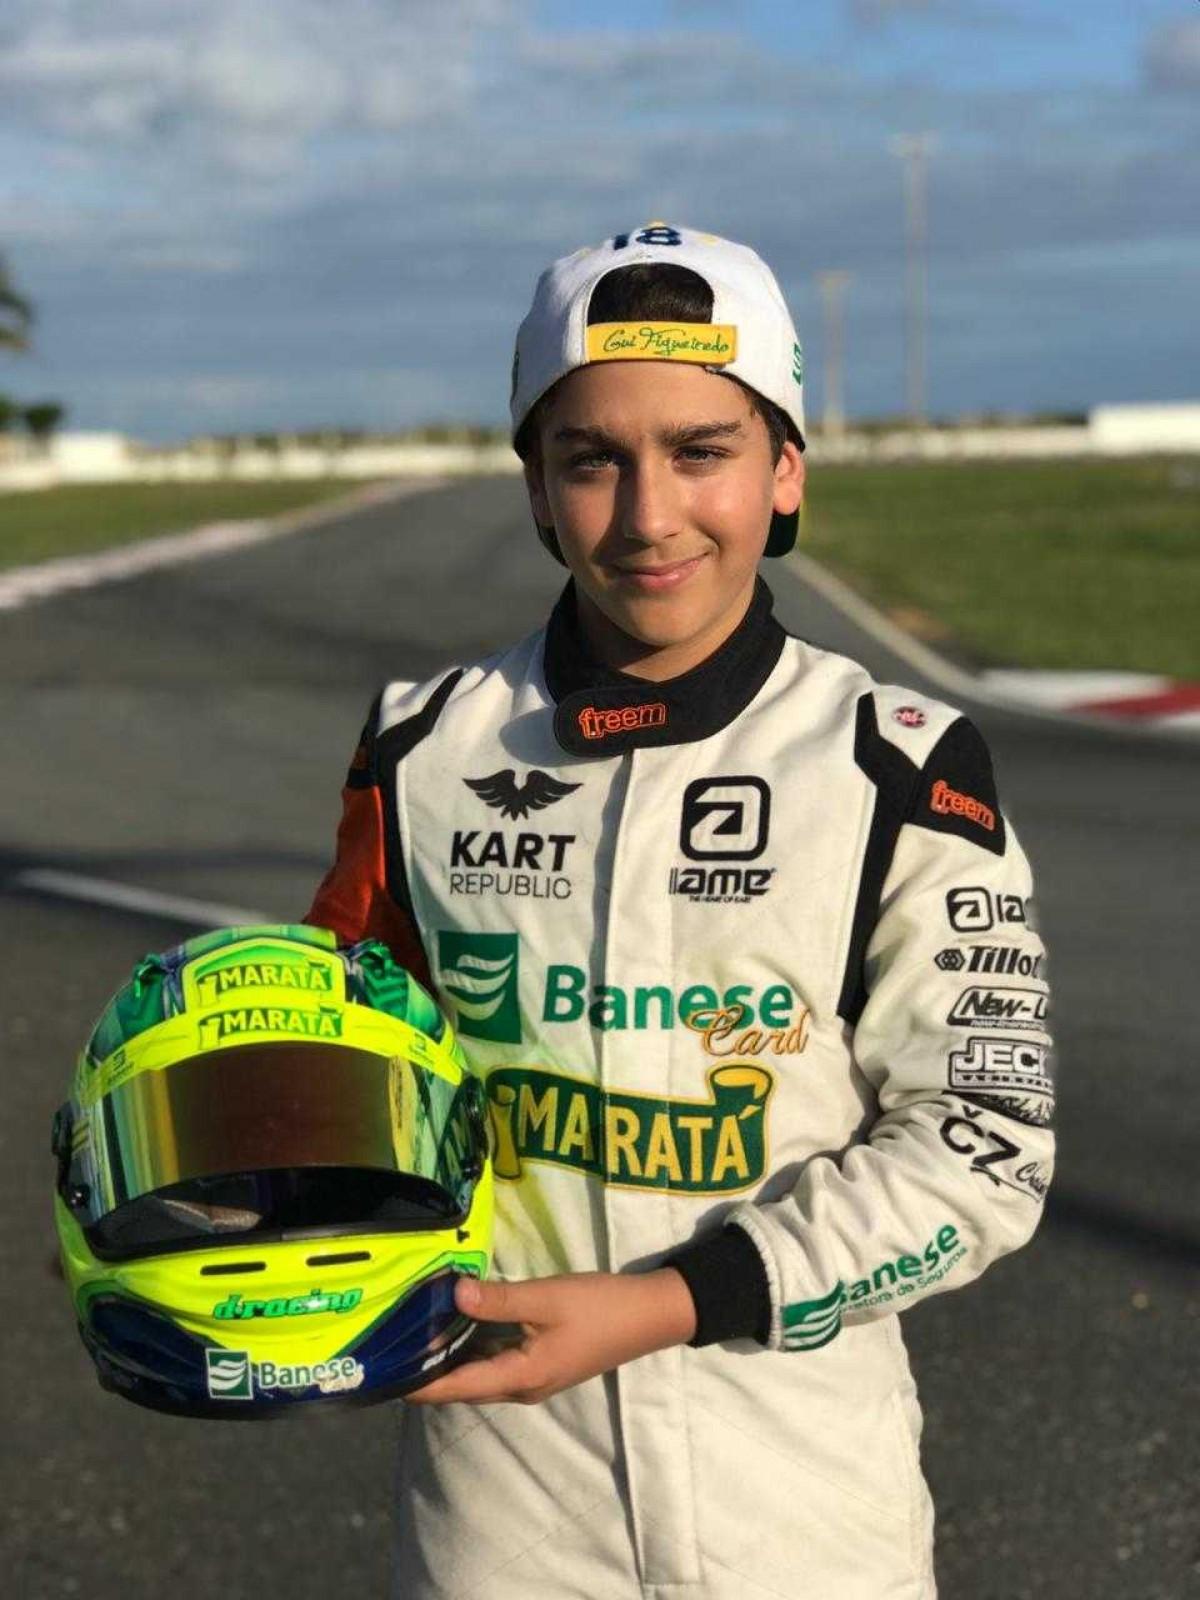 Guilherme Figueiredo vai disputar a Copa Brasil de Kart em Santa Catarina (Foto: Via FM assessoria)